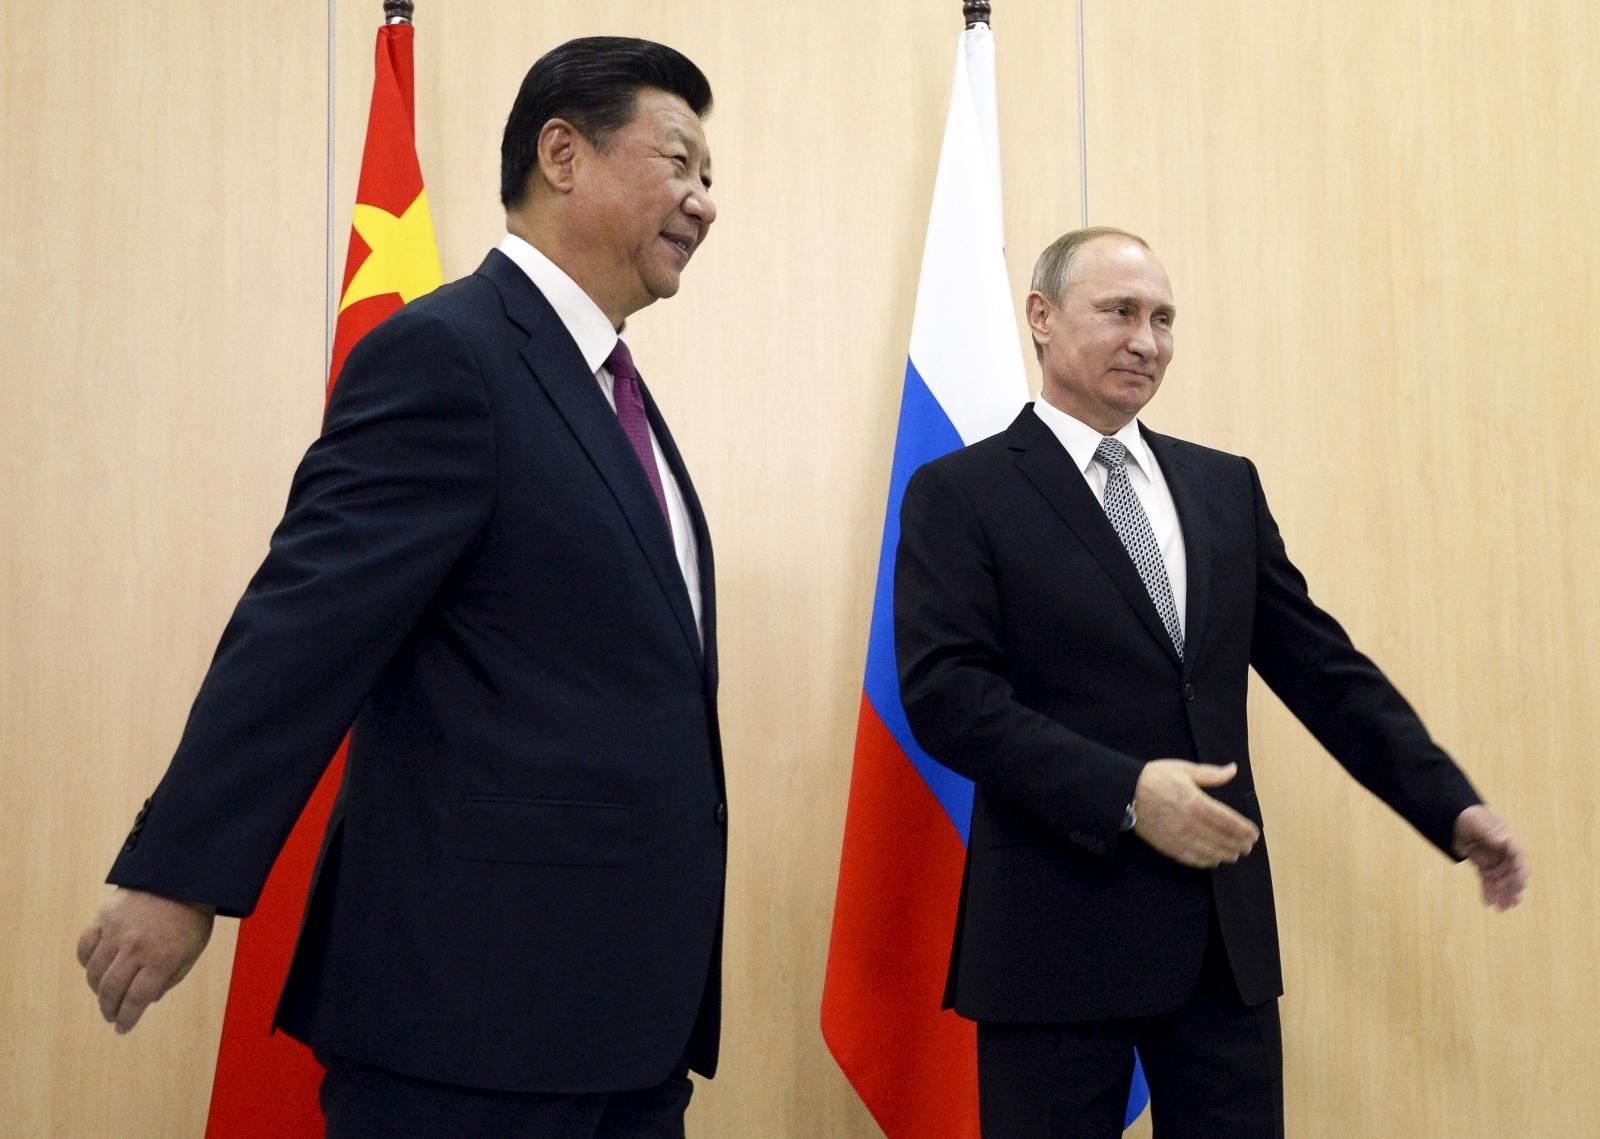 Vladimir Putin in China